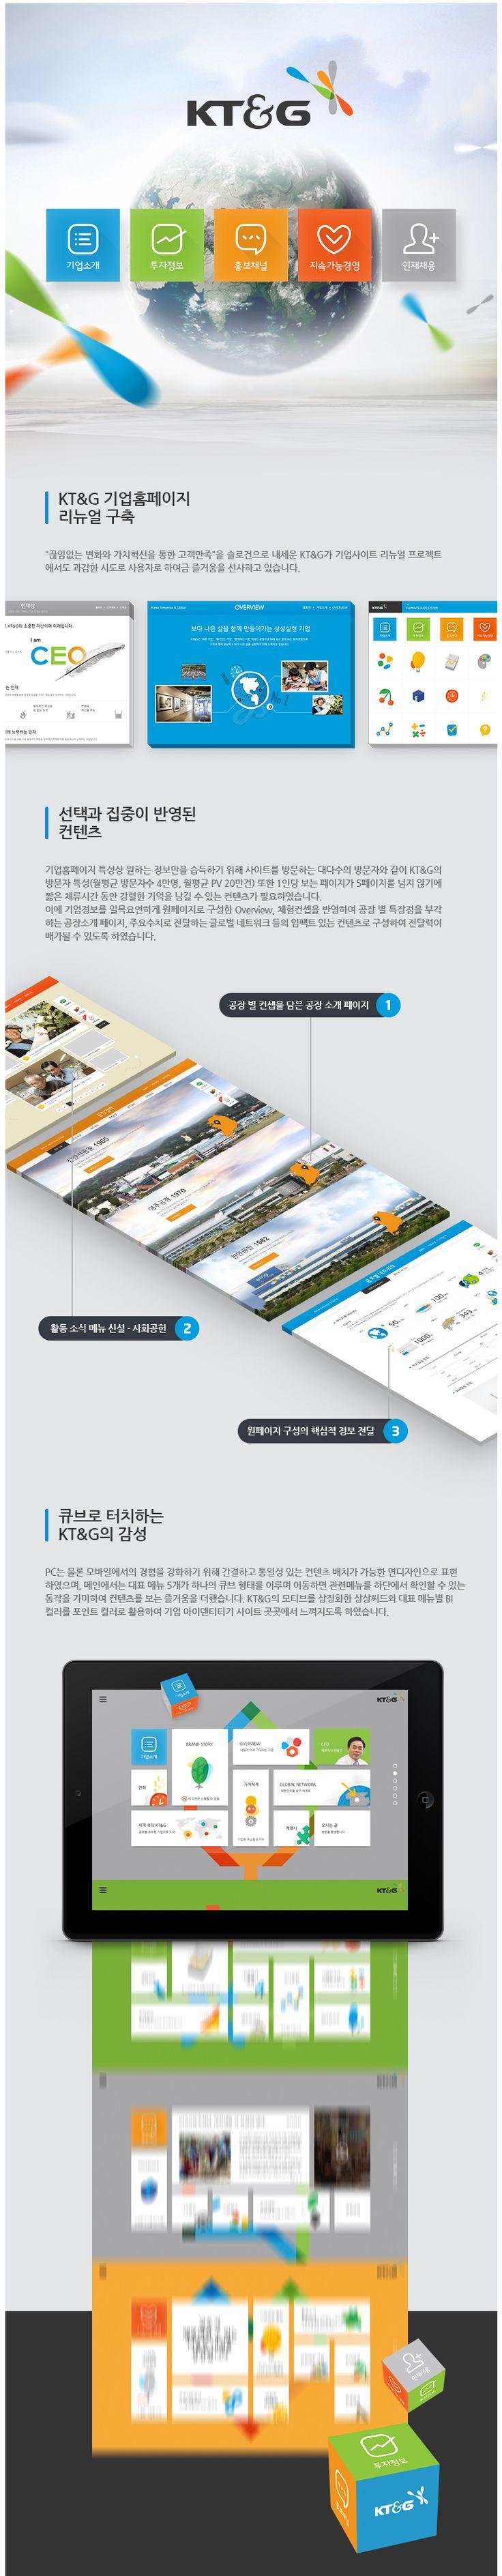 KT&G 기업사이트 리뉴얼 구축